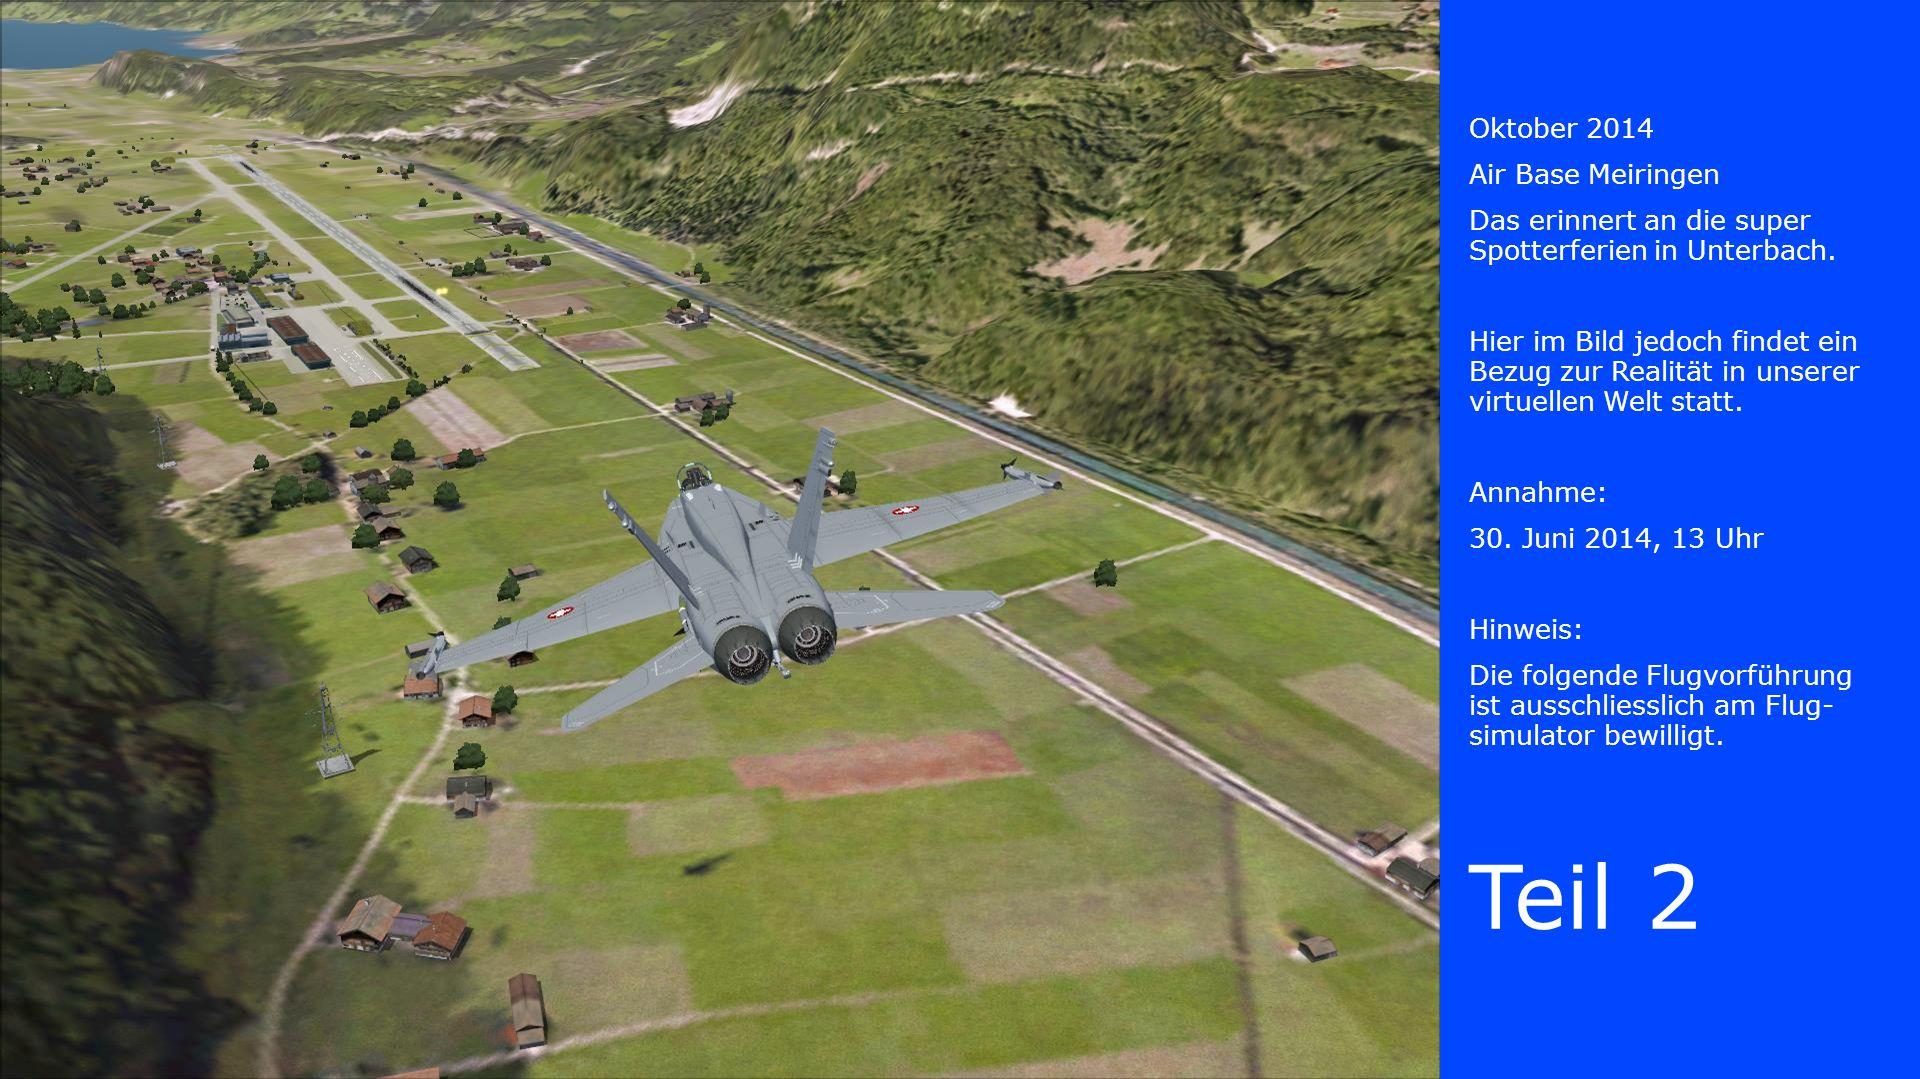 Oktober 2014 Air Base Meiringen Das erinnert an die super Spotterferien in Unterbach.